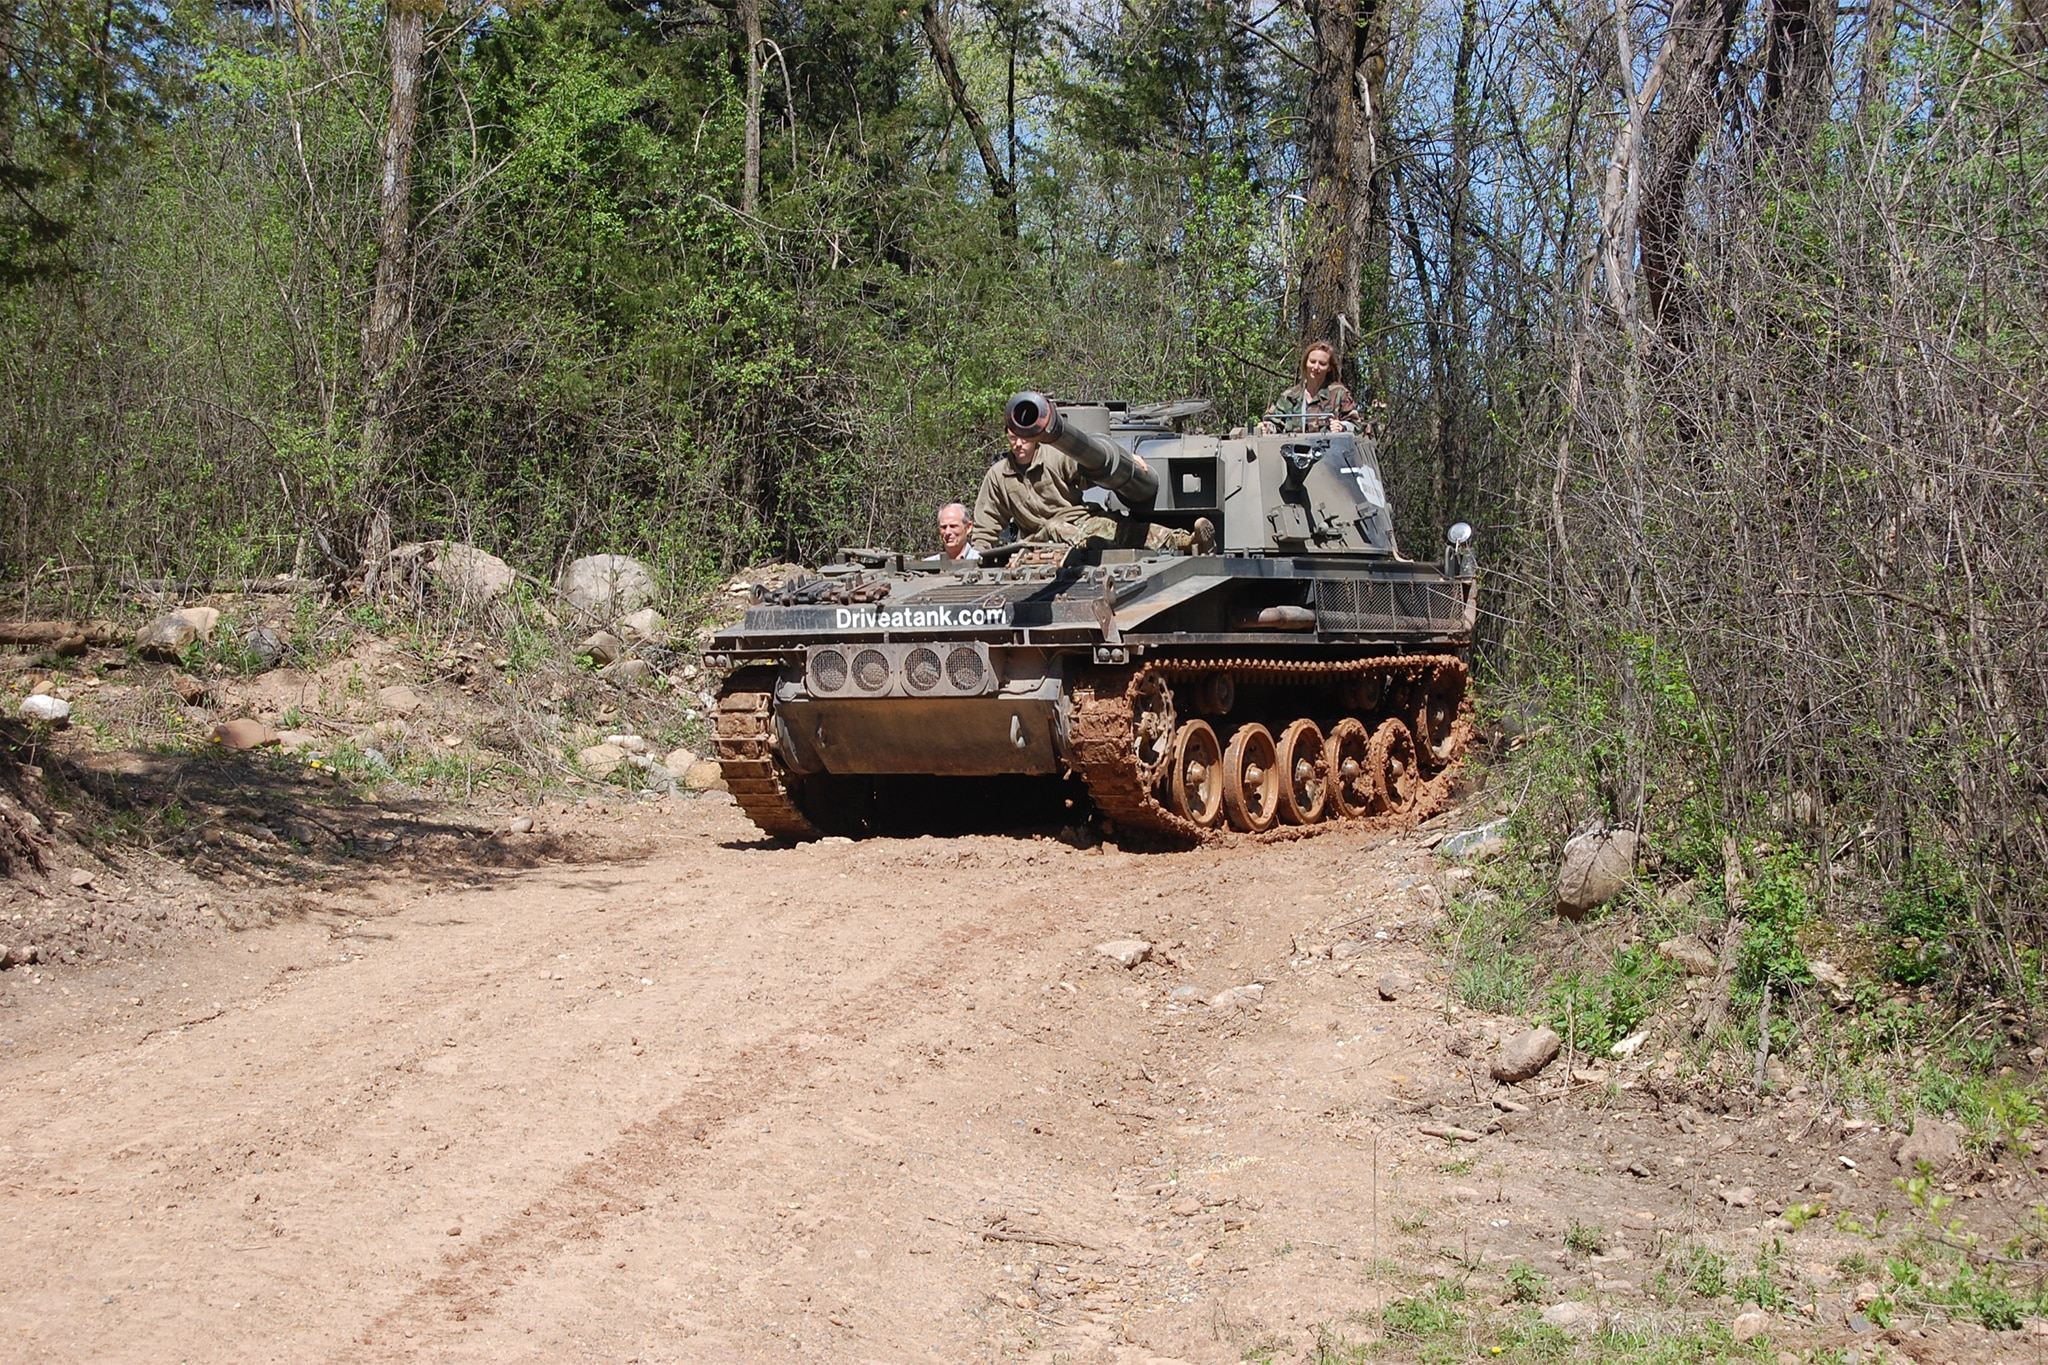 tank drive sherman era wwii earning stripes magazine packages call start visit information